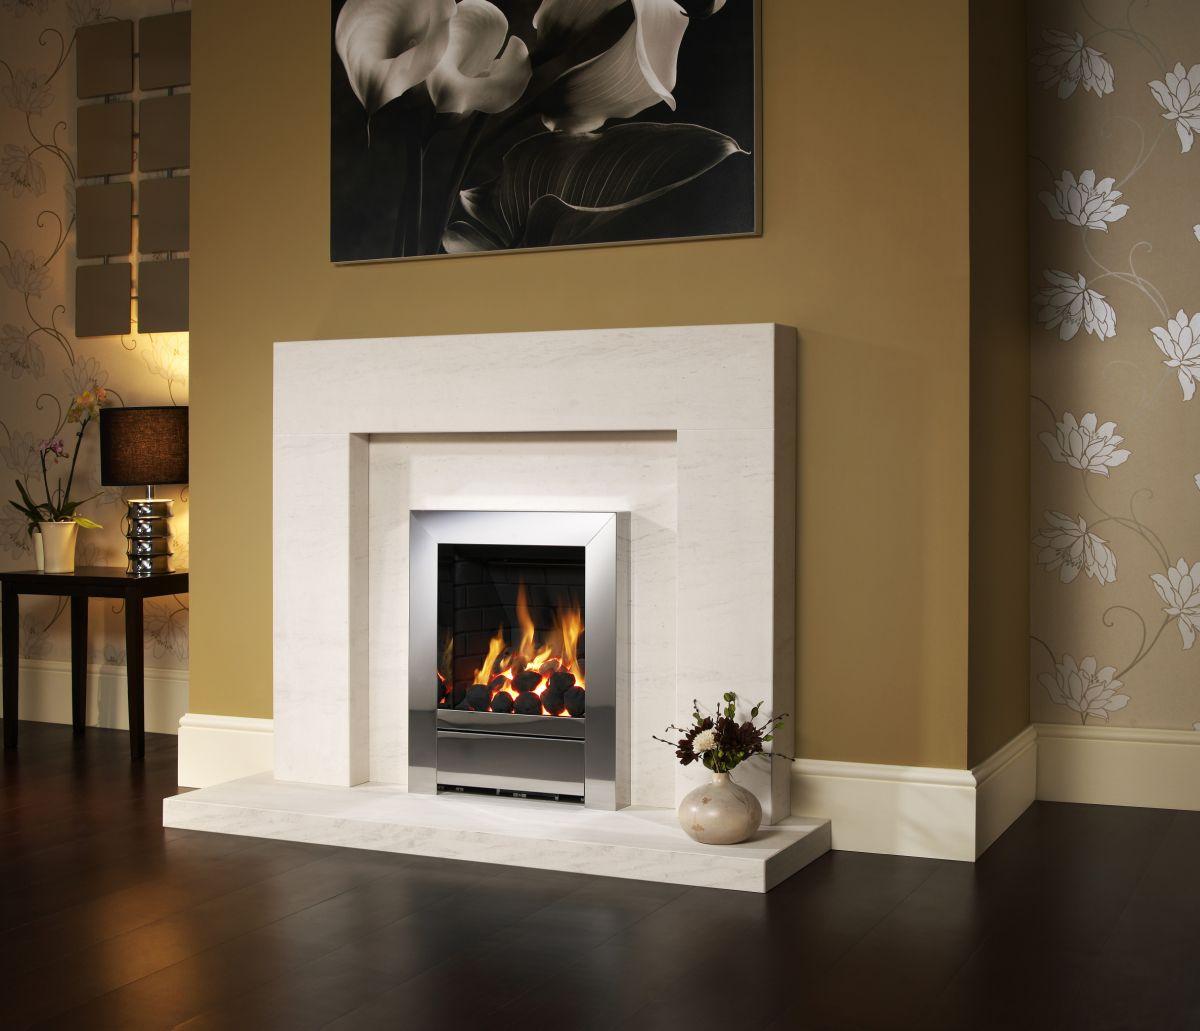 Mutable Tv Fireplace Surround Ideas Wood Marble Fireplace Ideas To S Fireplace Surround Ideas houzz 01 Fireplace Surround Ideas